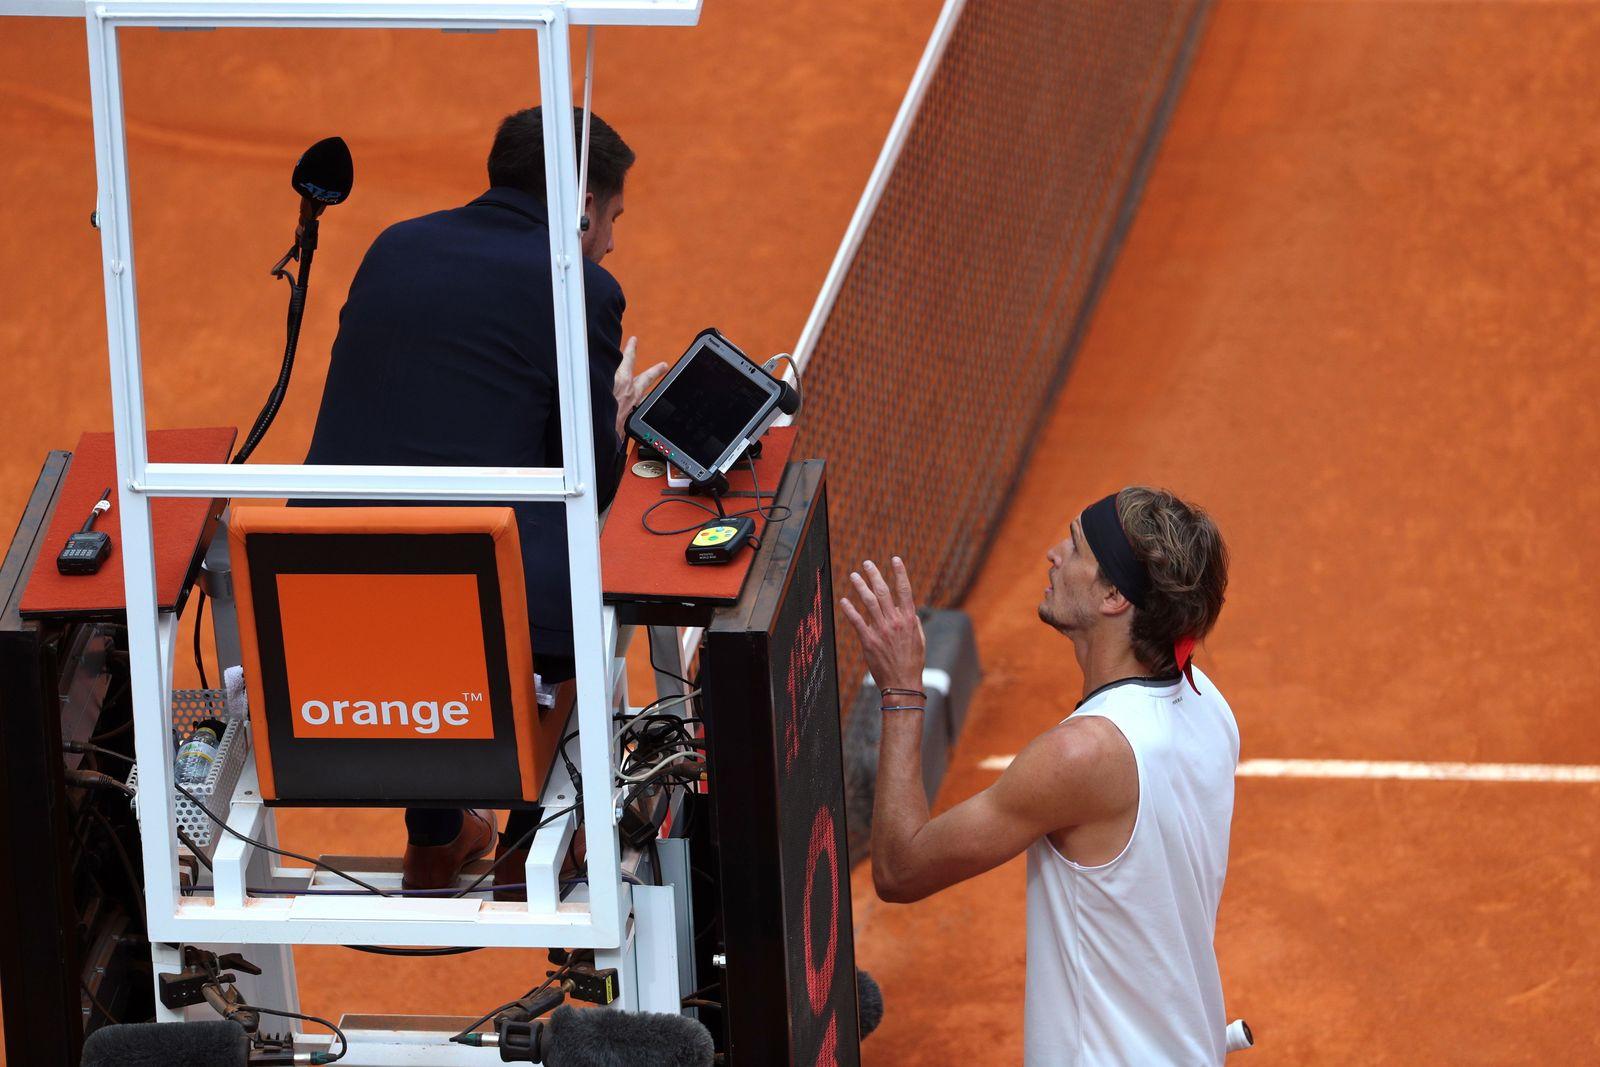 Madrid Open tennis tournament